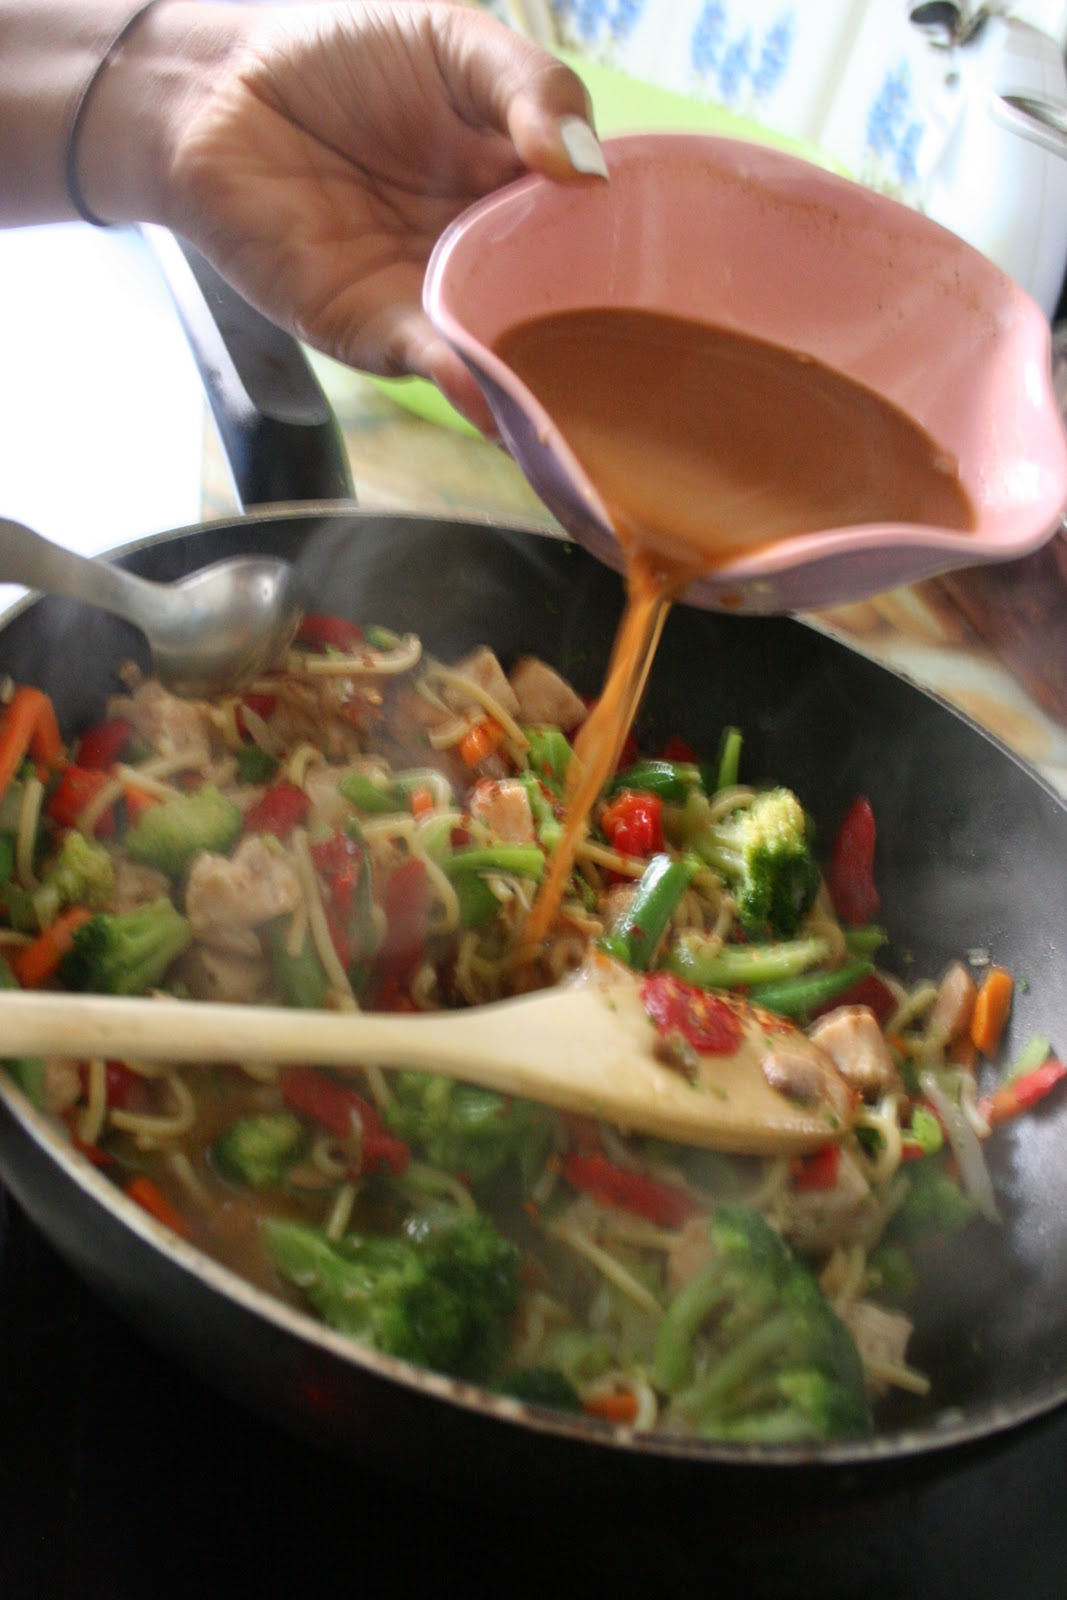 how to cook stir fry veggies